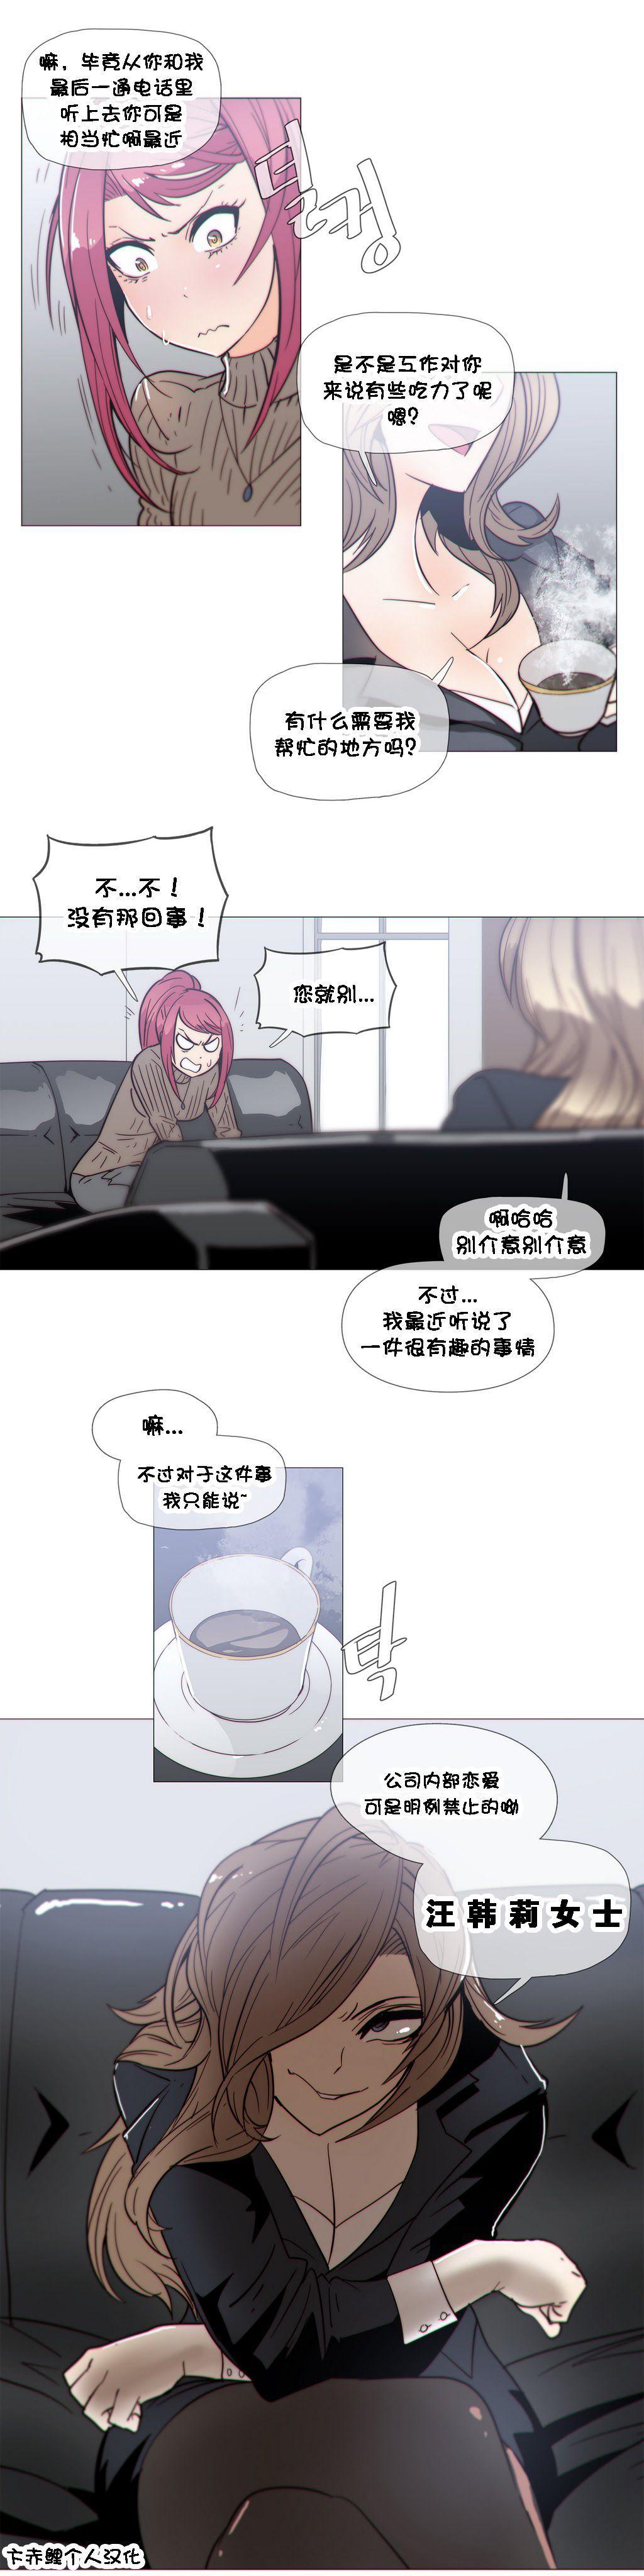 HouseHold Affairs 【卞赤鲤个人汉化】1~33话(持续更新中) 572